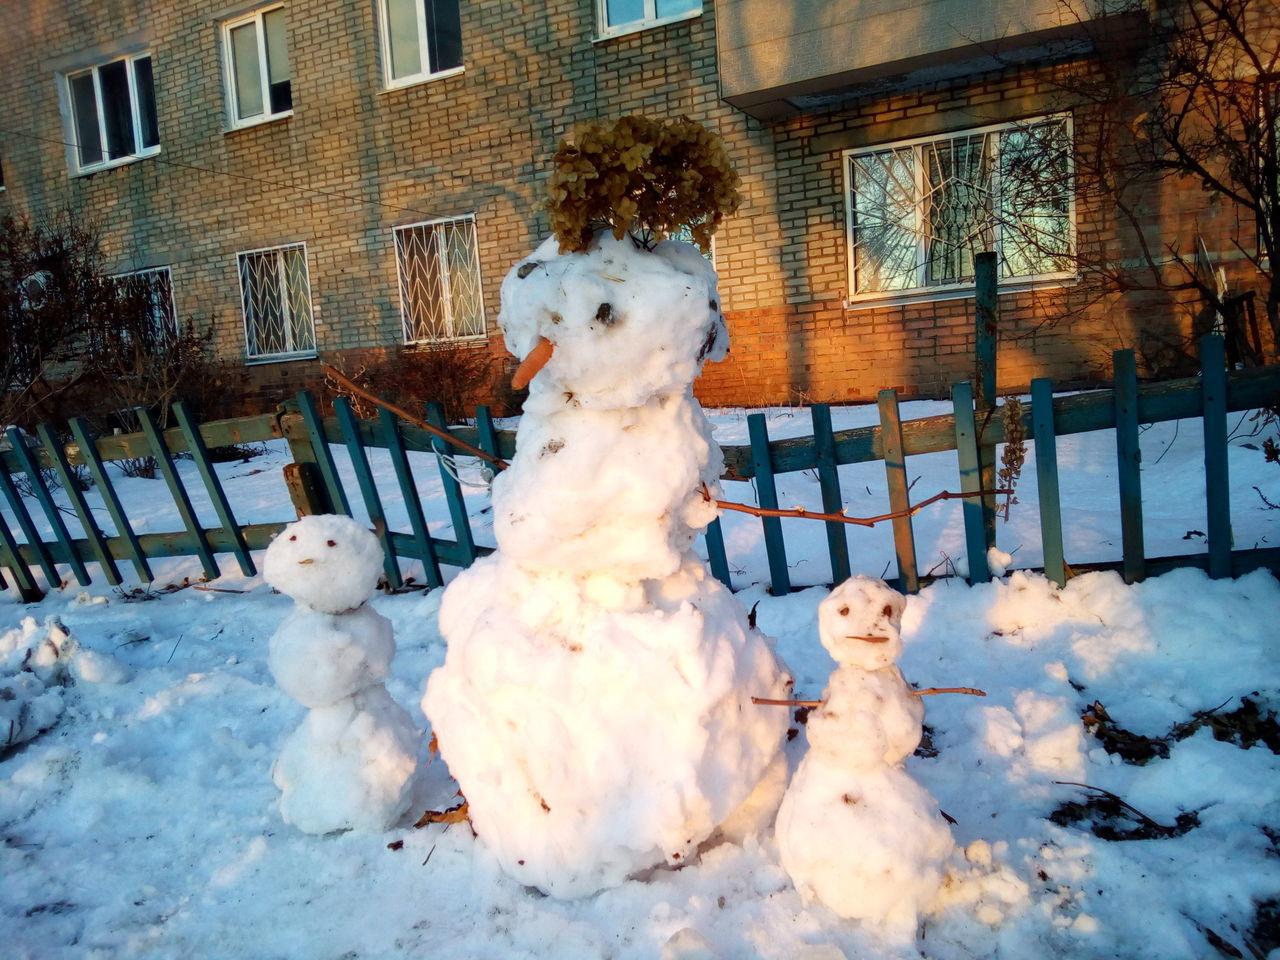 Beautiful stock photos of schneemann, winter, snow, cold temperature, animal themes